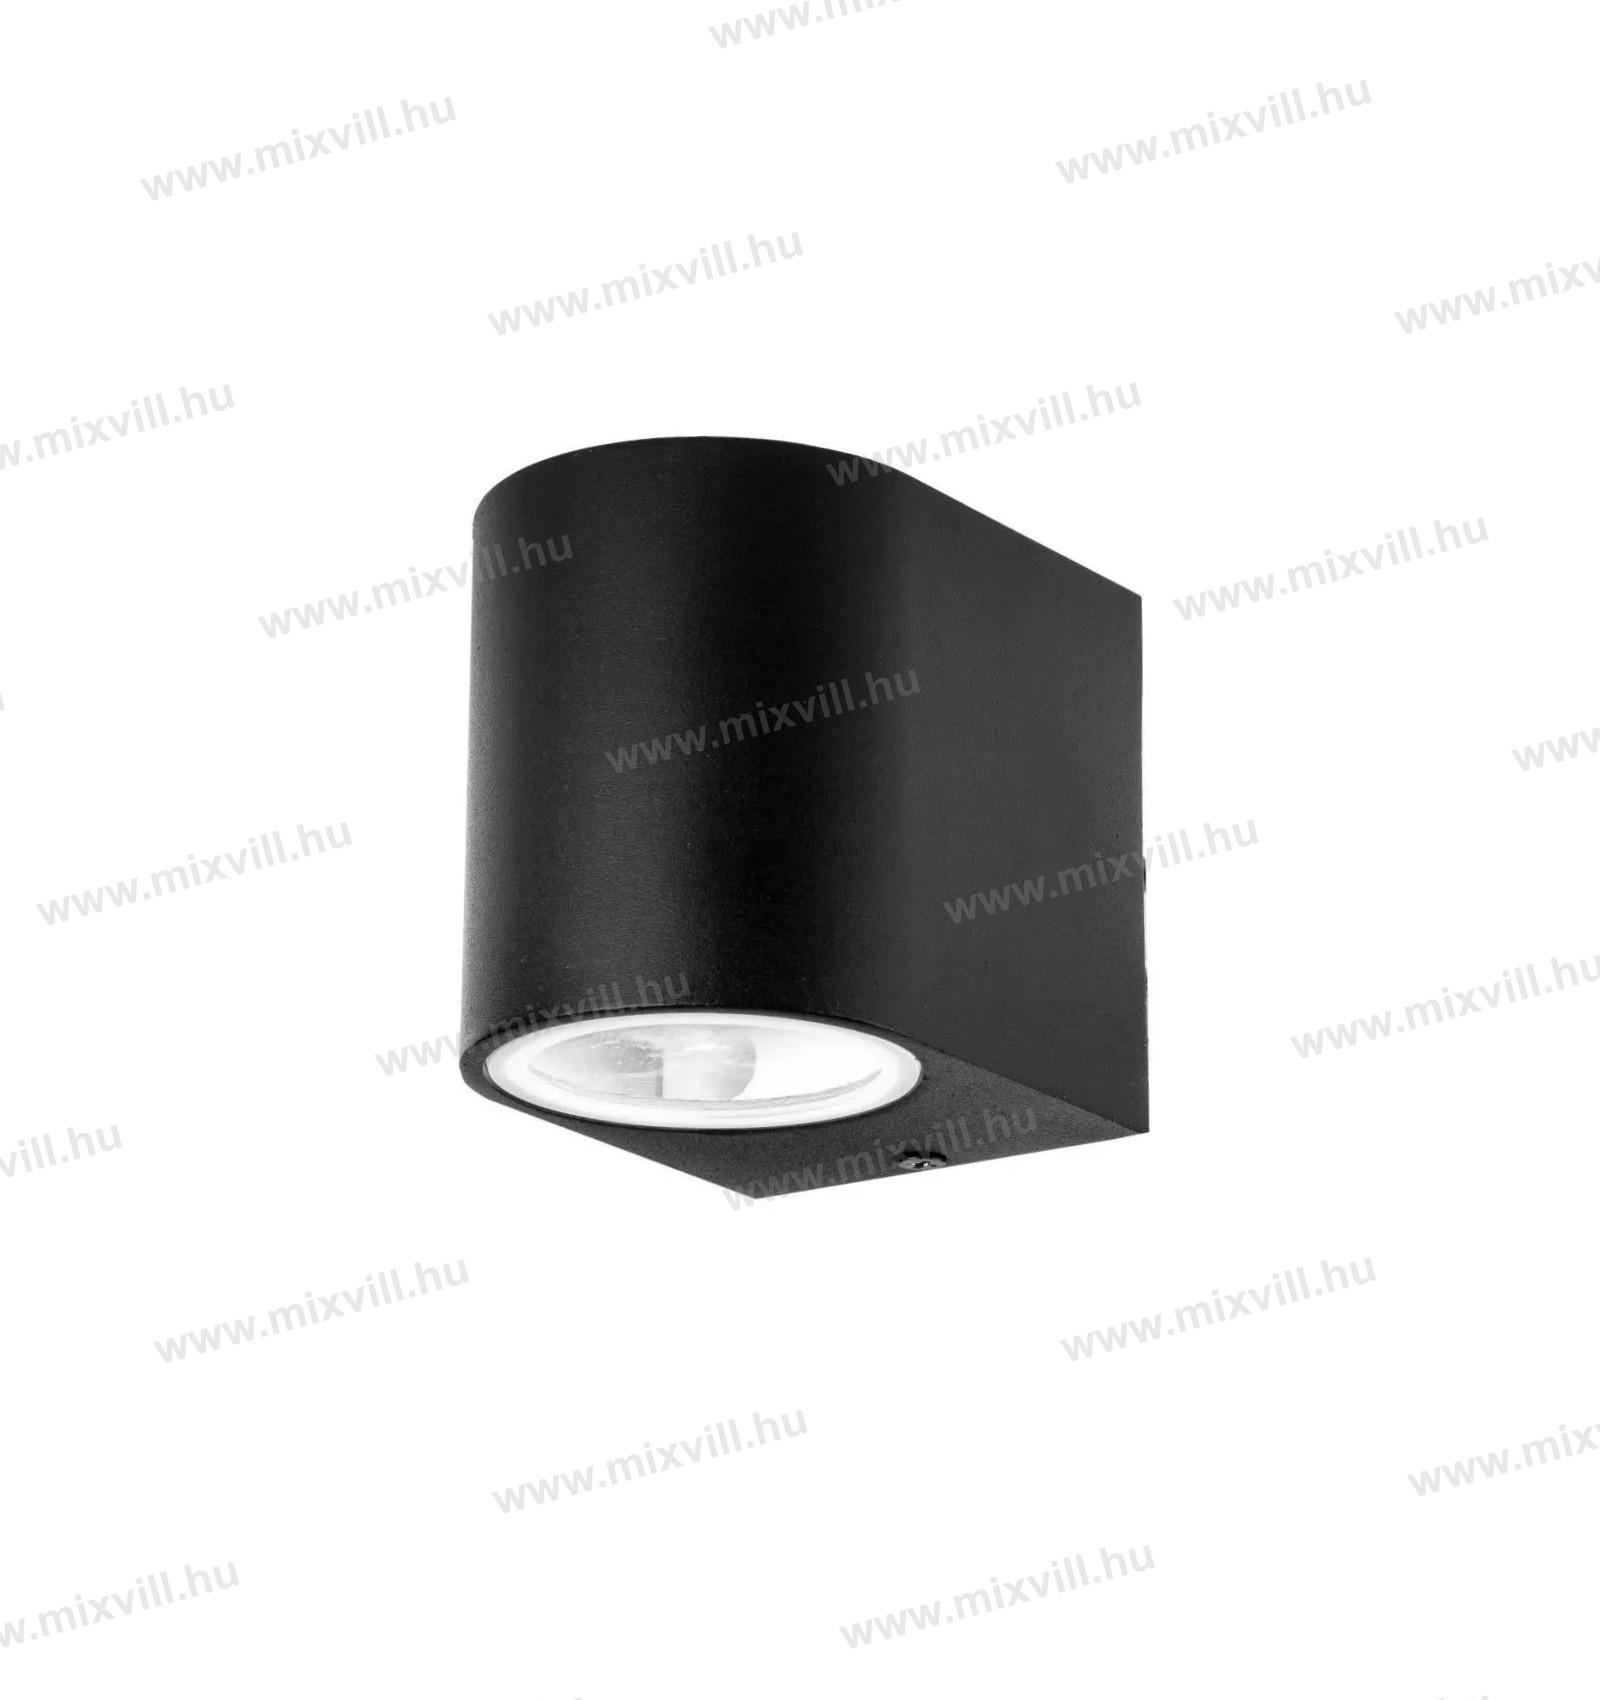 sku-7508-v-tak-elegans-modern-fali-lampa-gu10-spot-foglalat-fekete